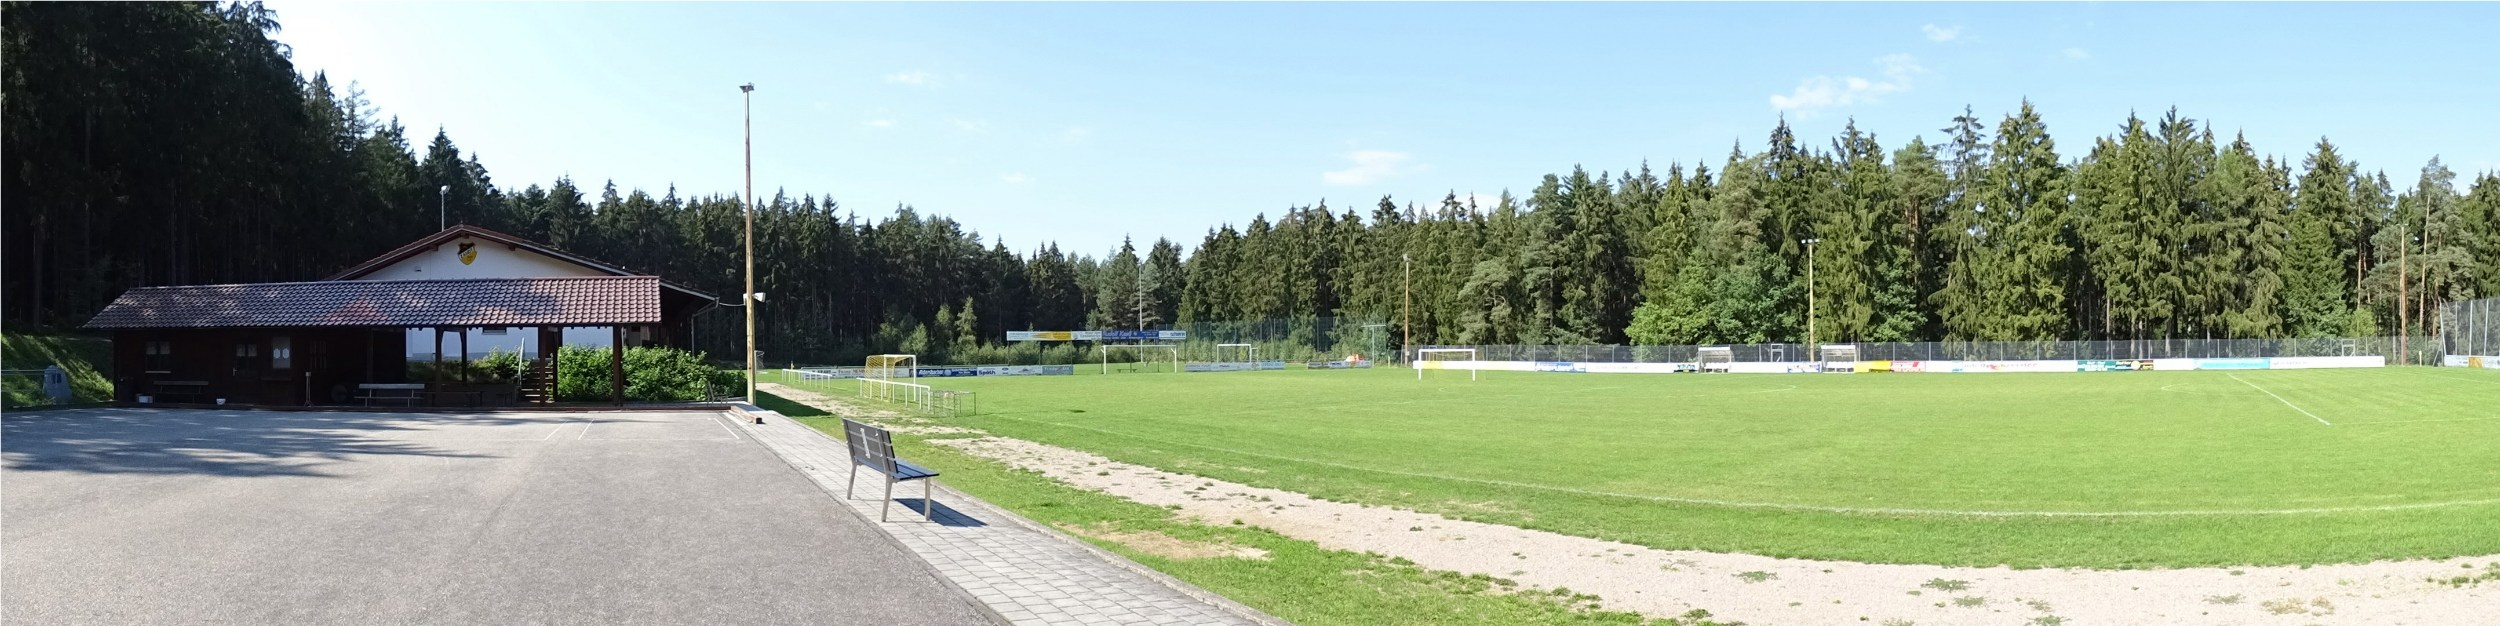 Stockbahn Panorama